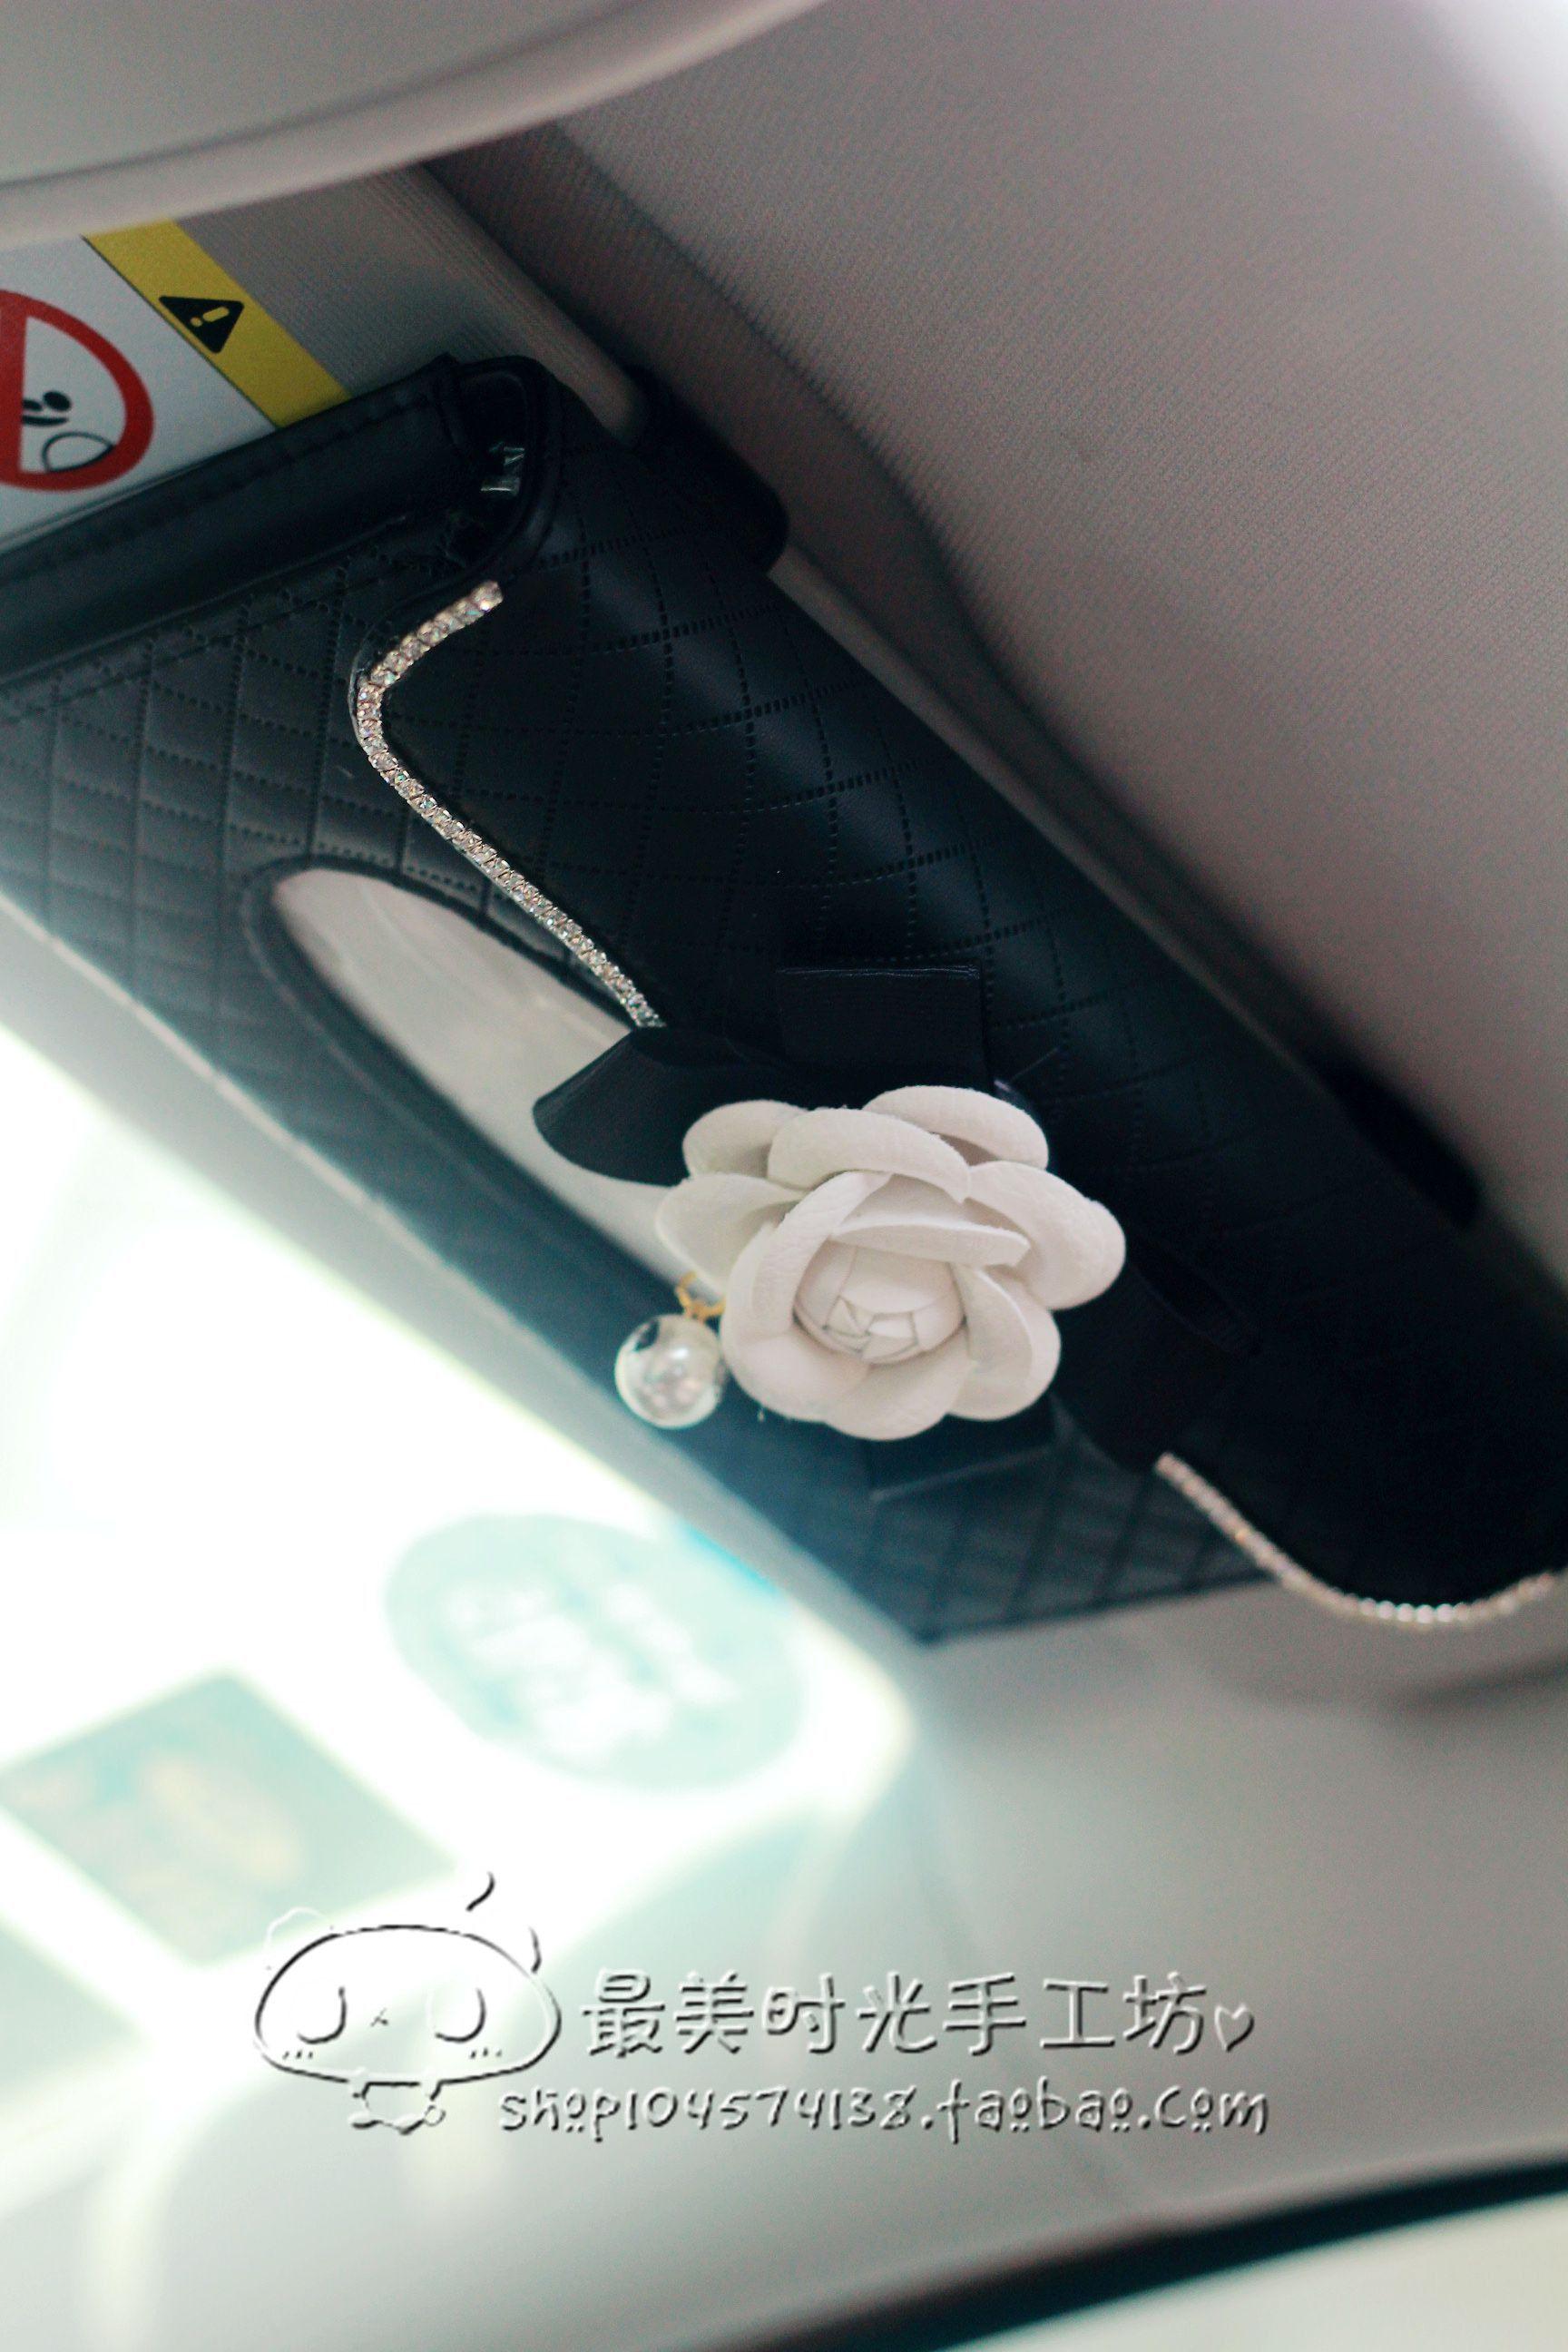 Camellia tissue box car visor high-grade leather car box jacket hanging vehicle interior female diamond